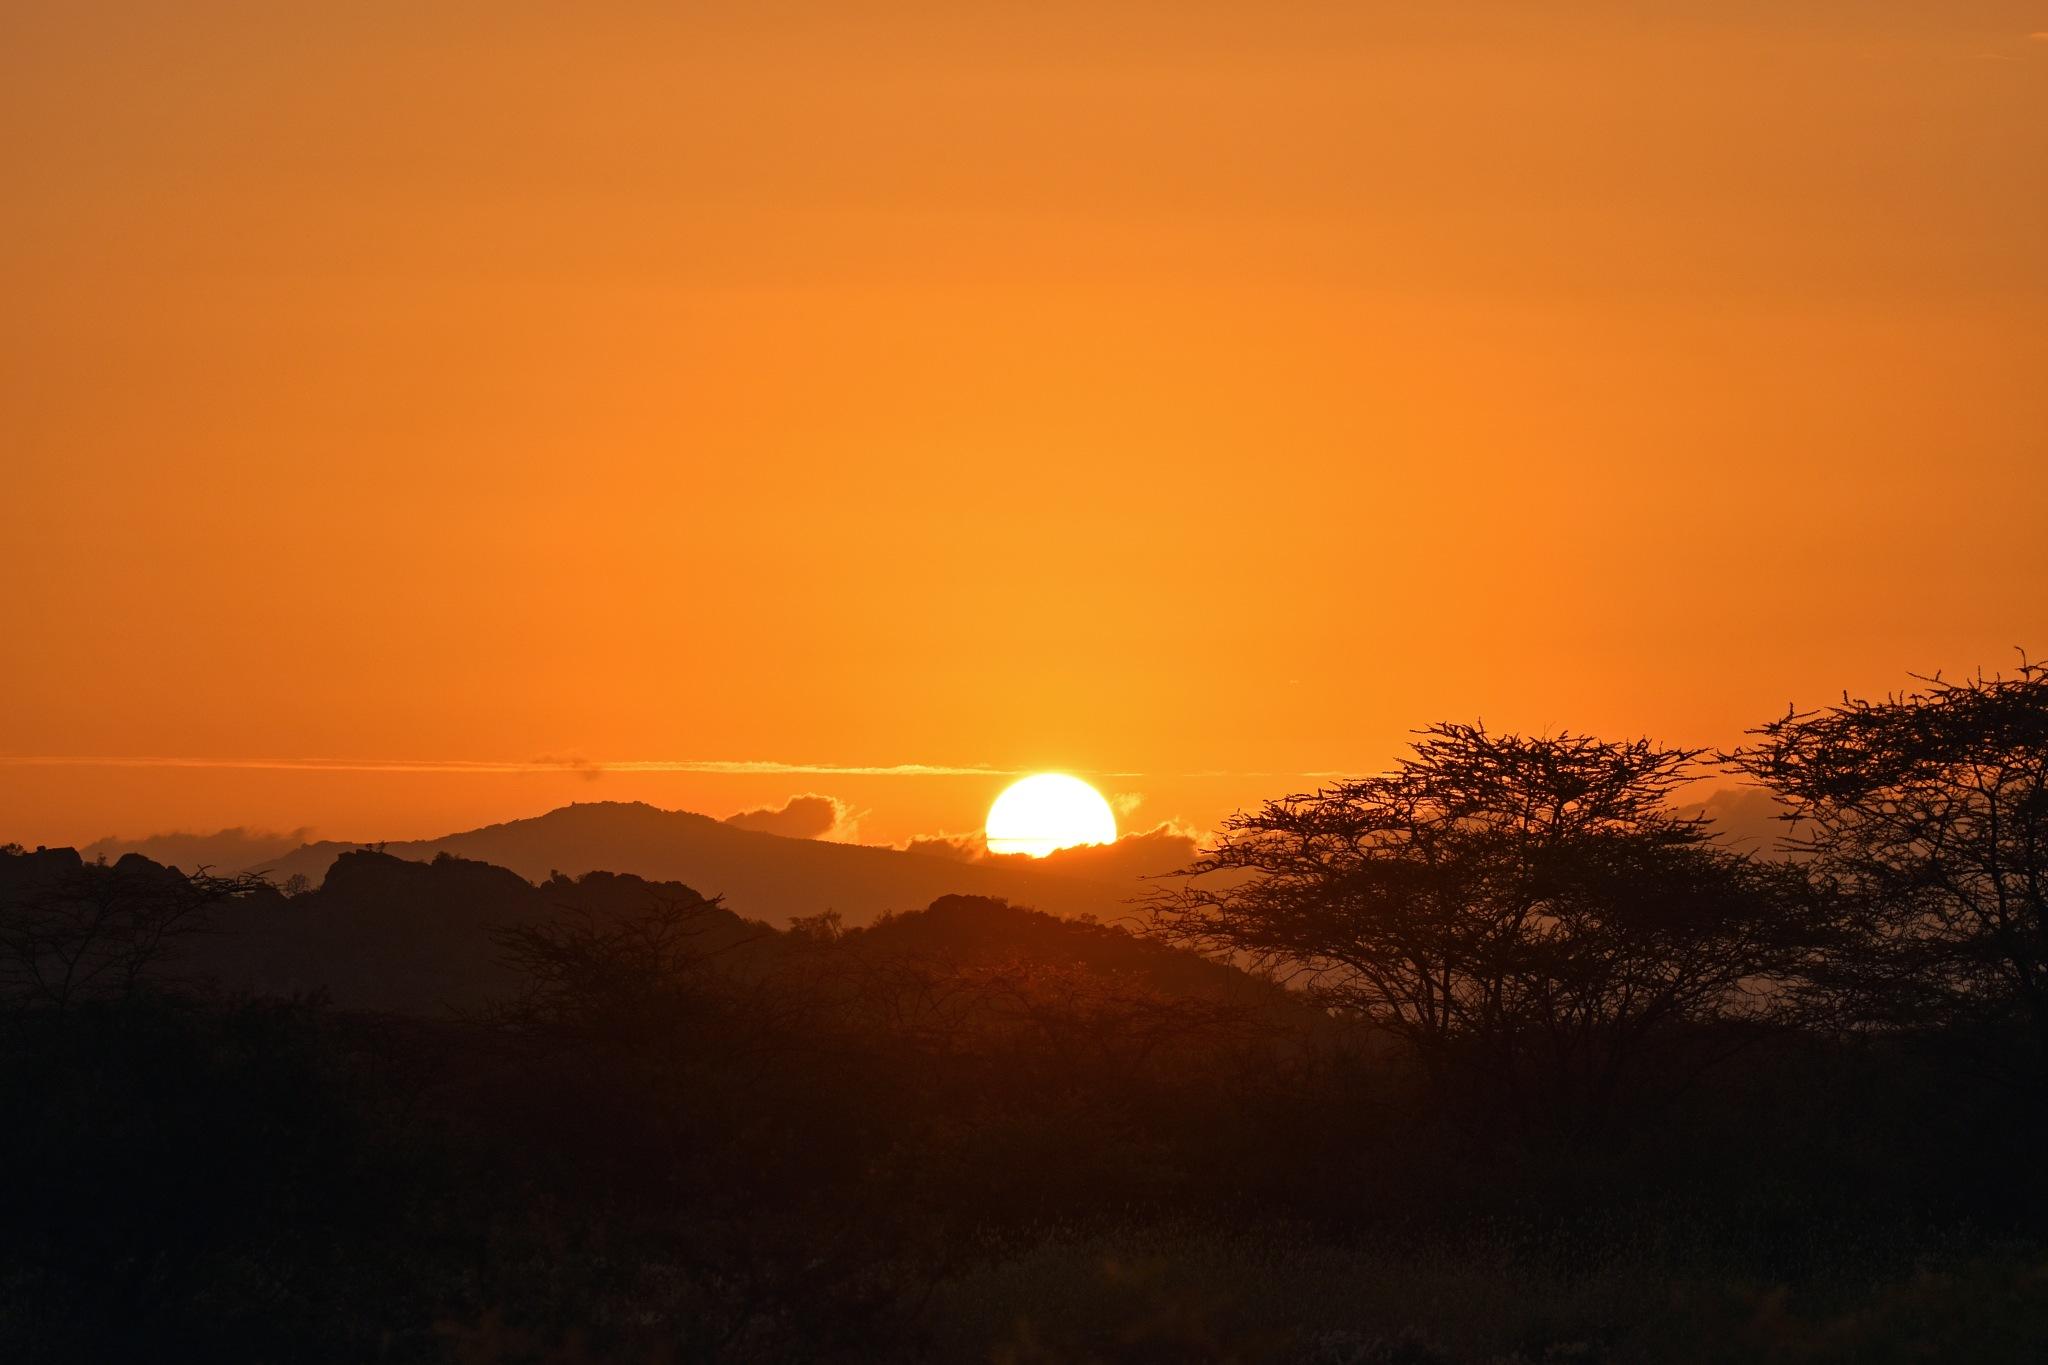 African Suneset by Chris B